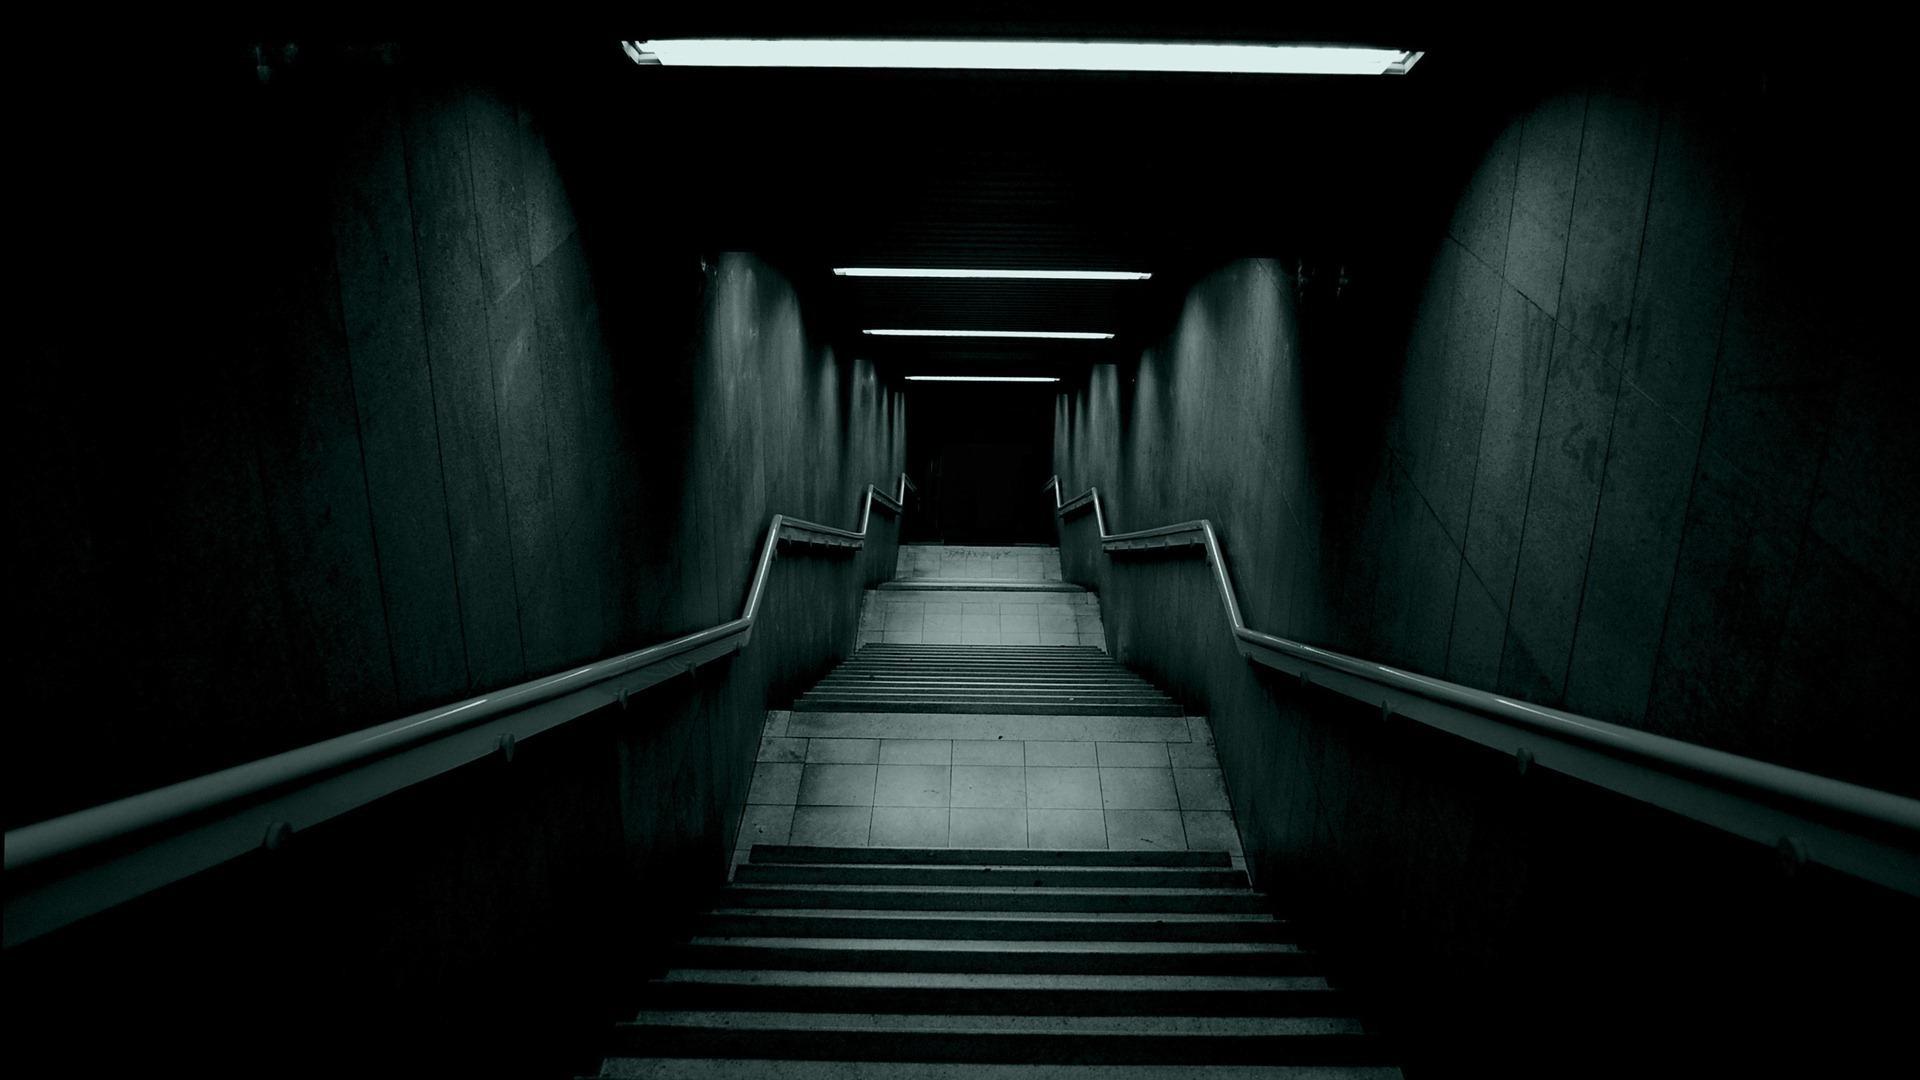 Hd Dark Wallpapers 82 Pictures